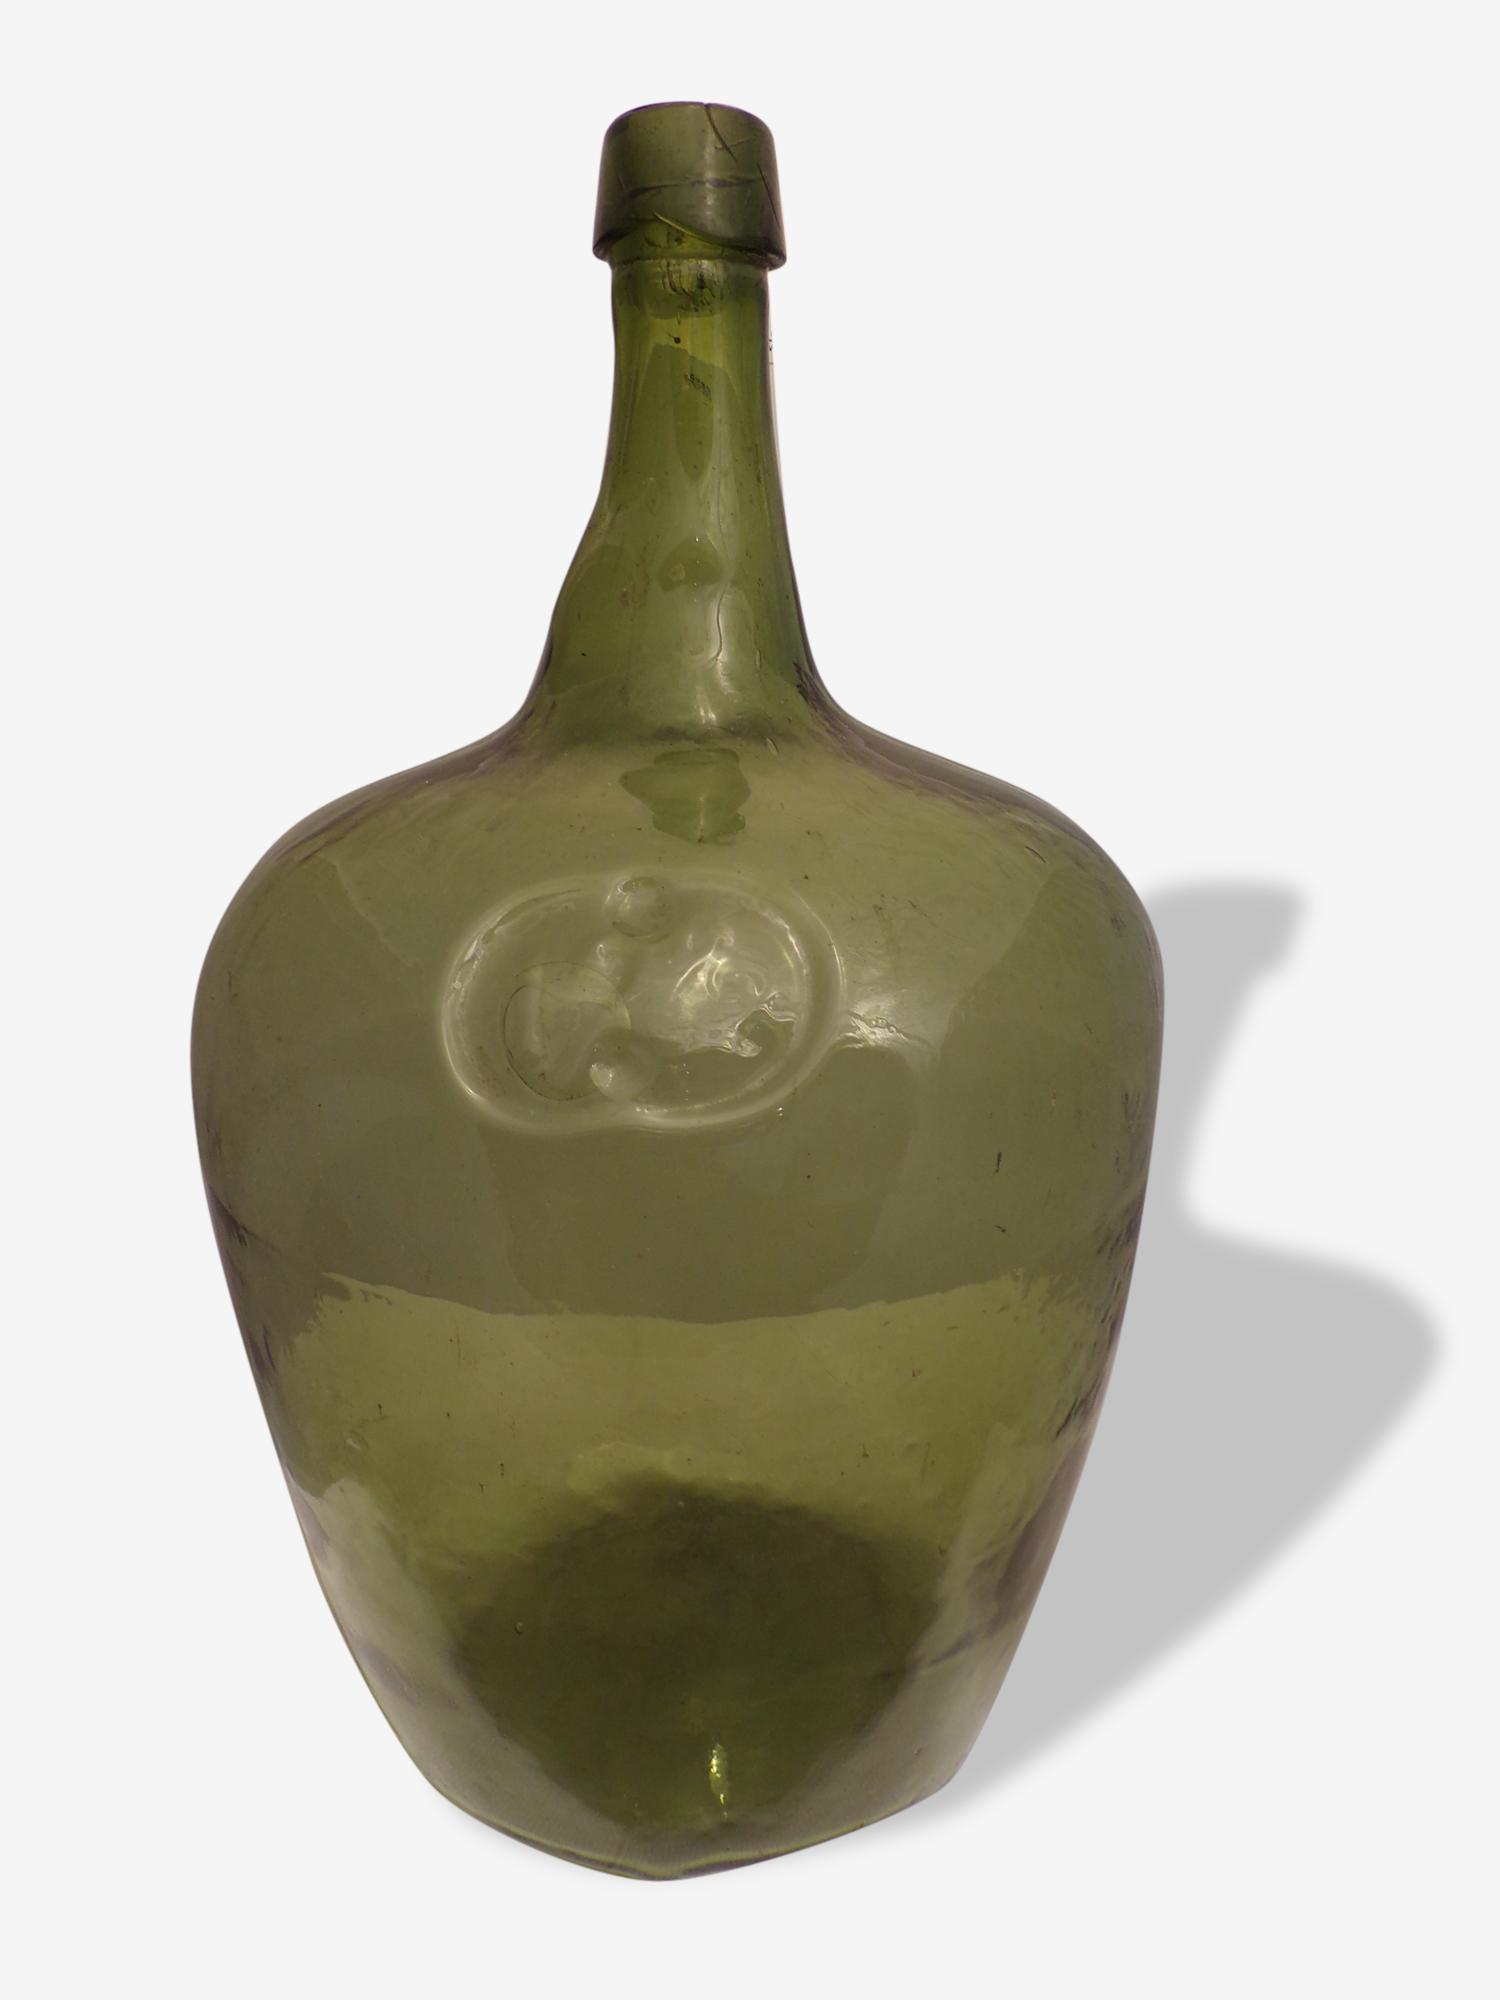 Dame Jeanne en verre vert 18 litres